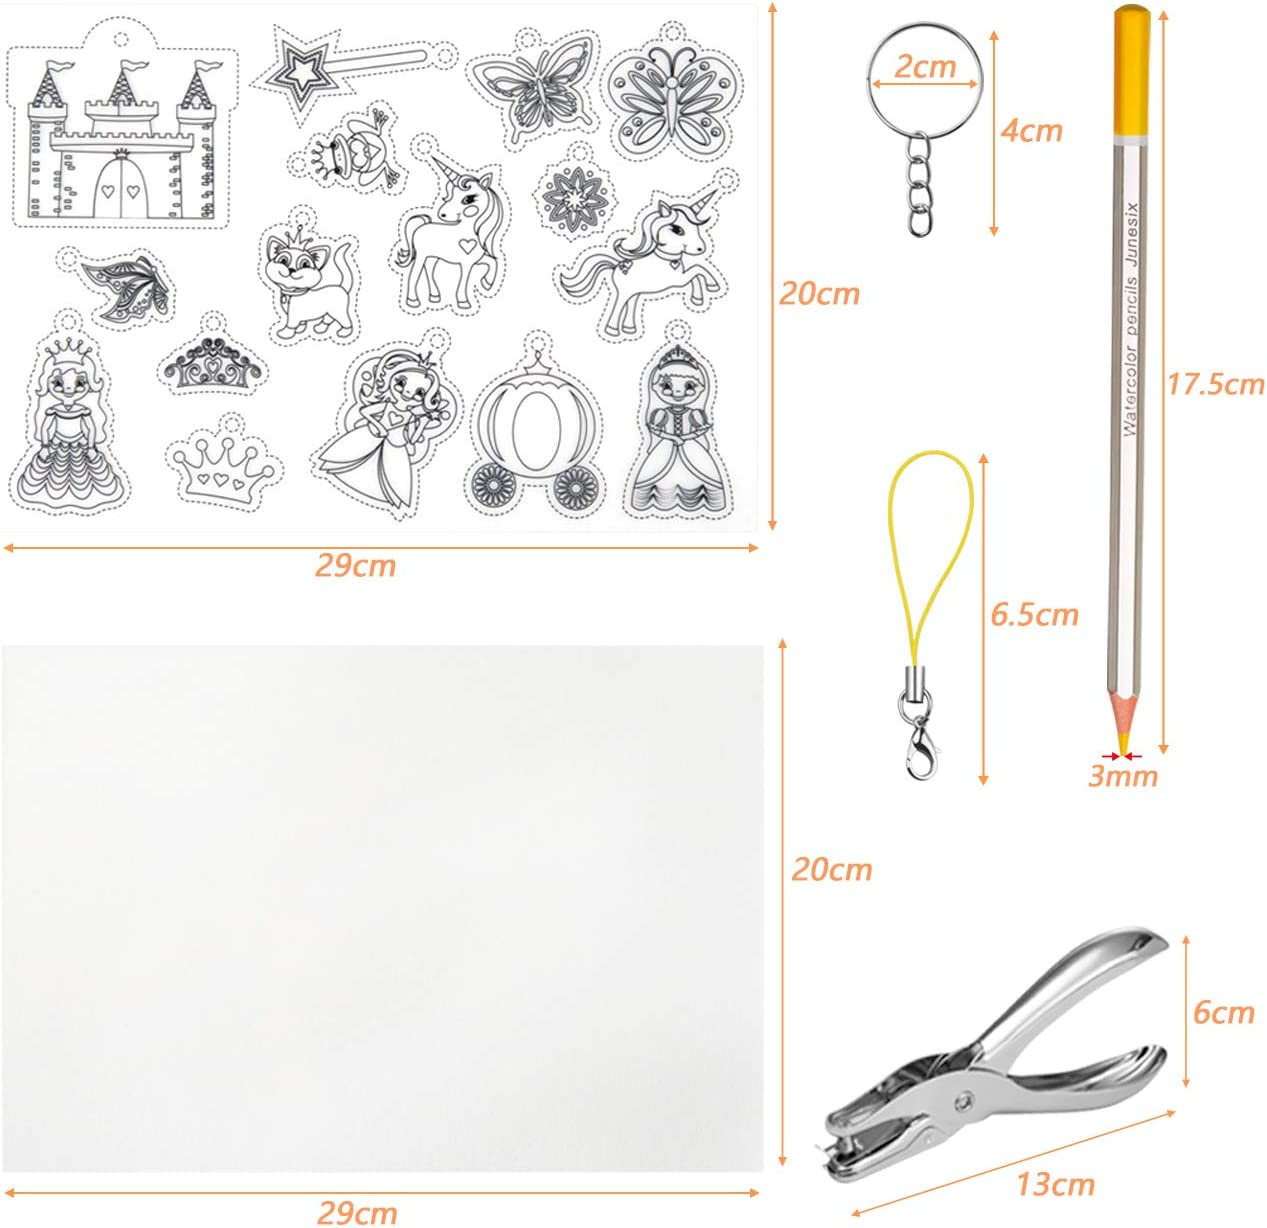 GWHOLE Kit de Hoja Termocontra/íble Pl/ástico Juguete de Pintura Manualidad para Ni/ño,Heat Shrink Plastic Sheet Kit